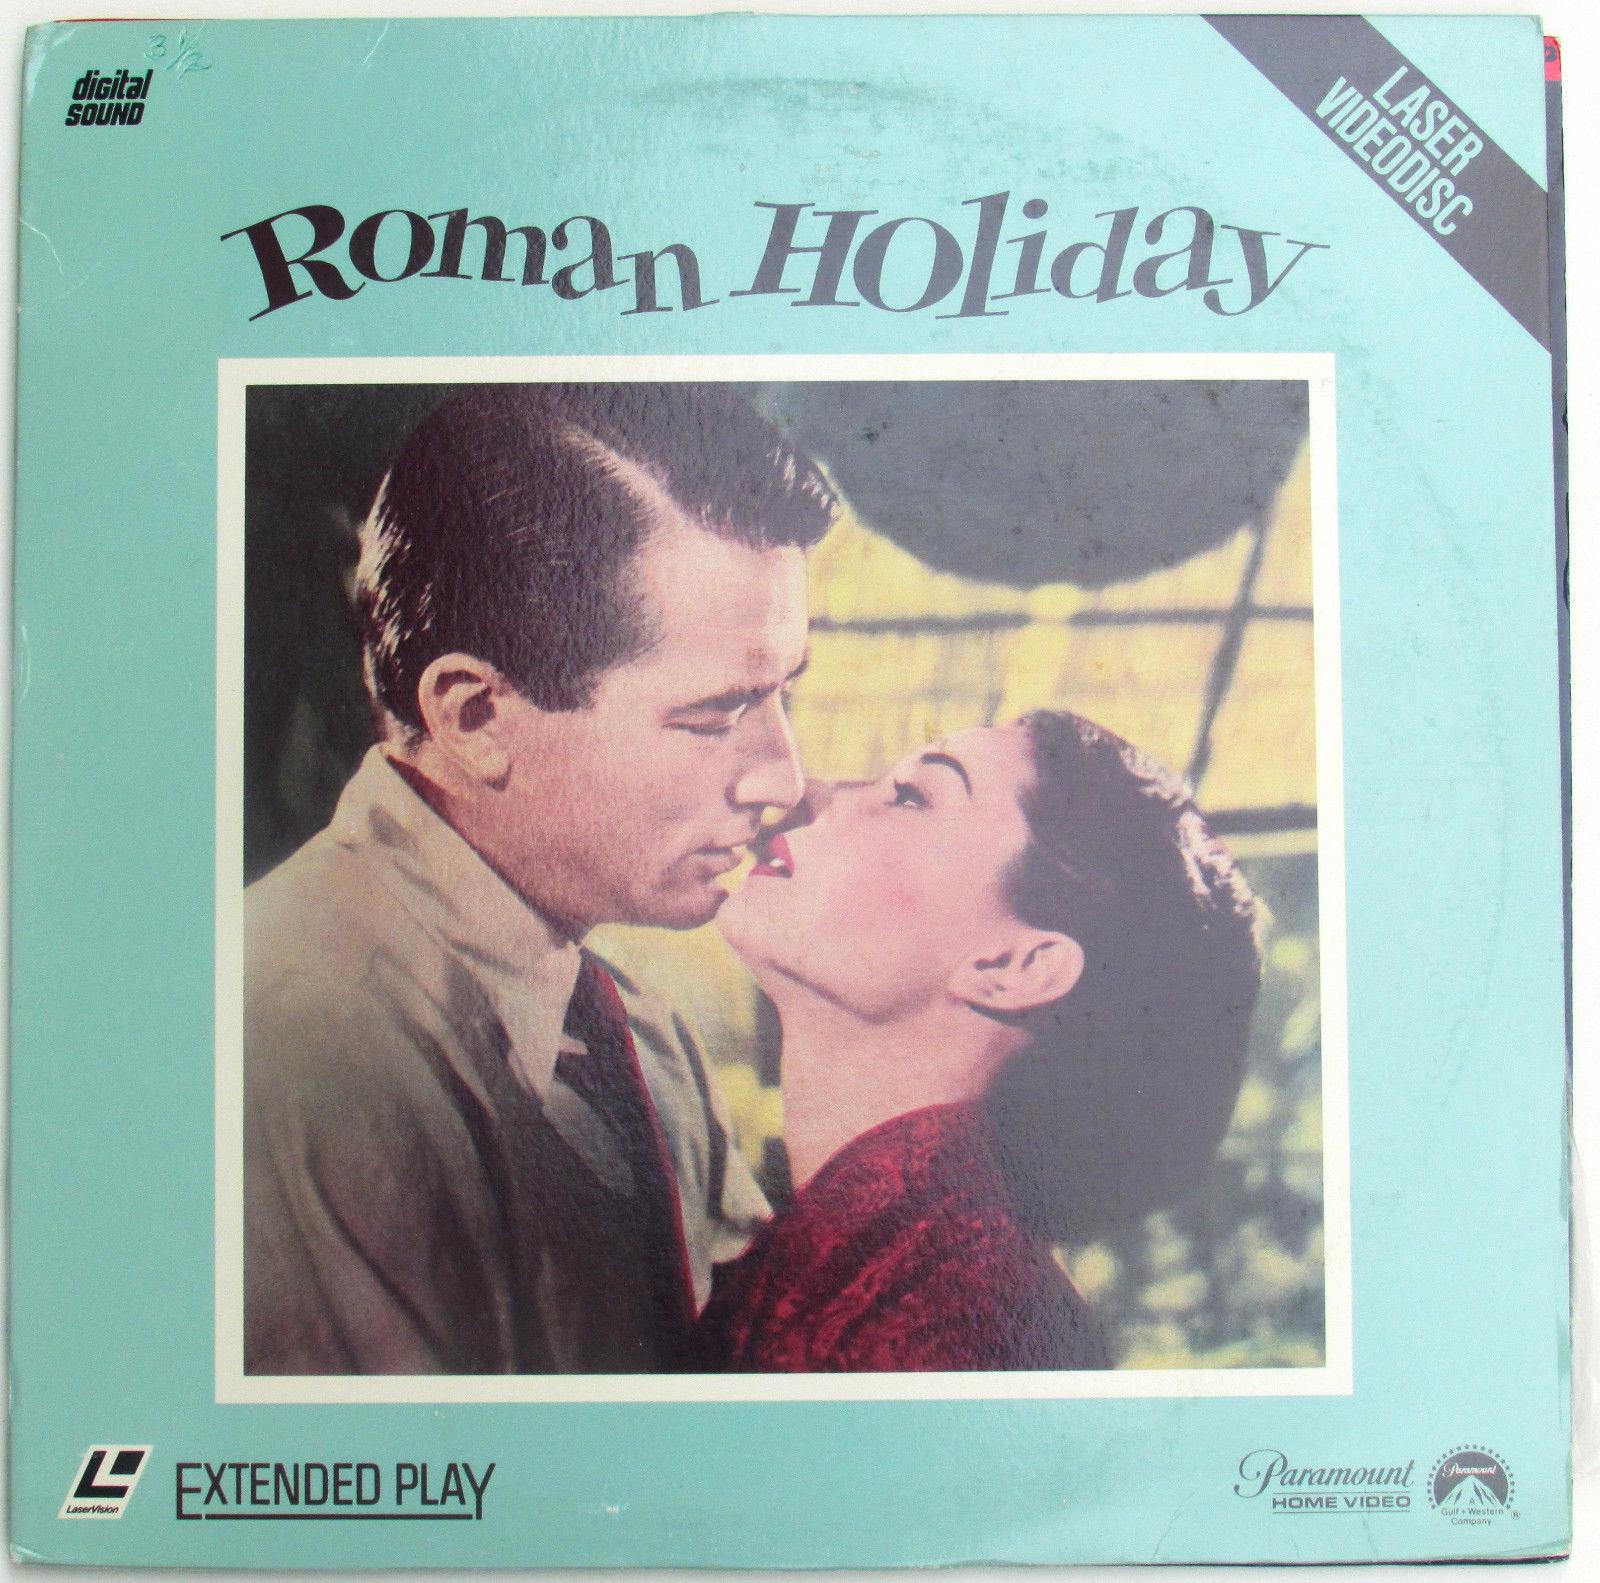 Roman holiday on laserdisc starring gregory peck audrey hepburn